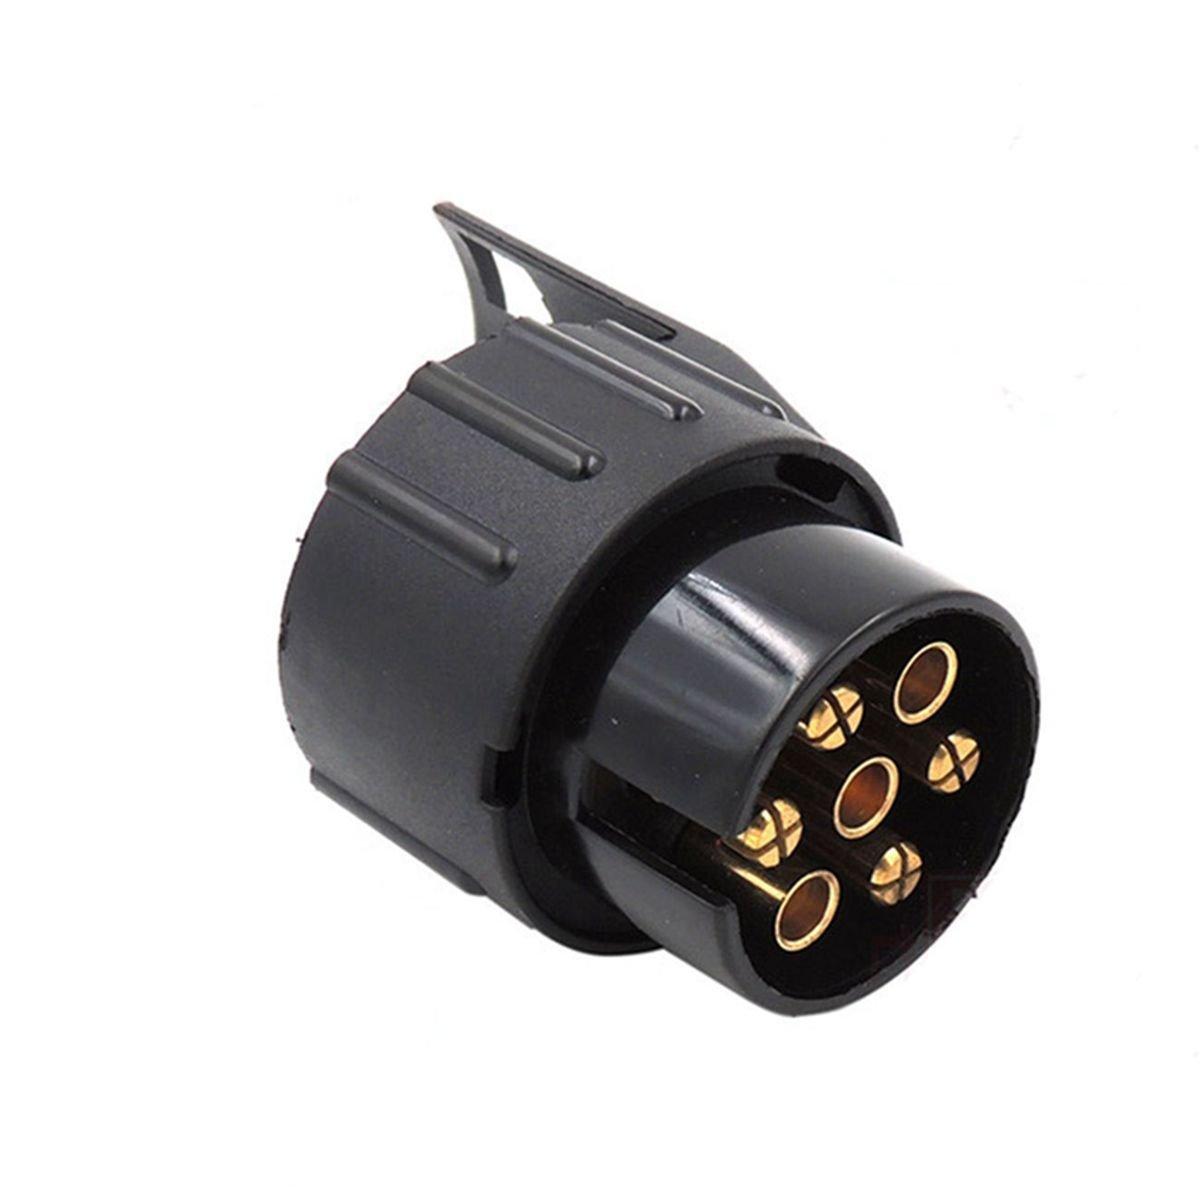 TIANOR Towbar Towing Socket 13 to 7 Pin Plug Adapter Trailer 12V Towbar Caravan Truck Electrical Adapter Converter Car Trailer Adaptor Conversion Adapter Trailer Plug